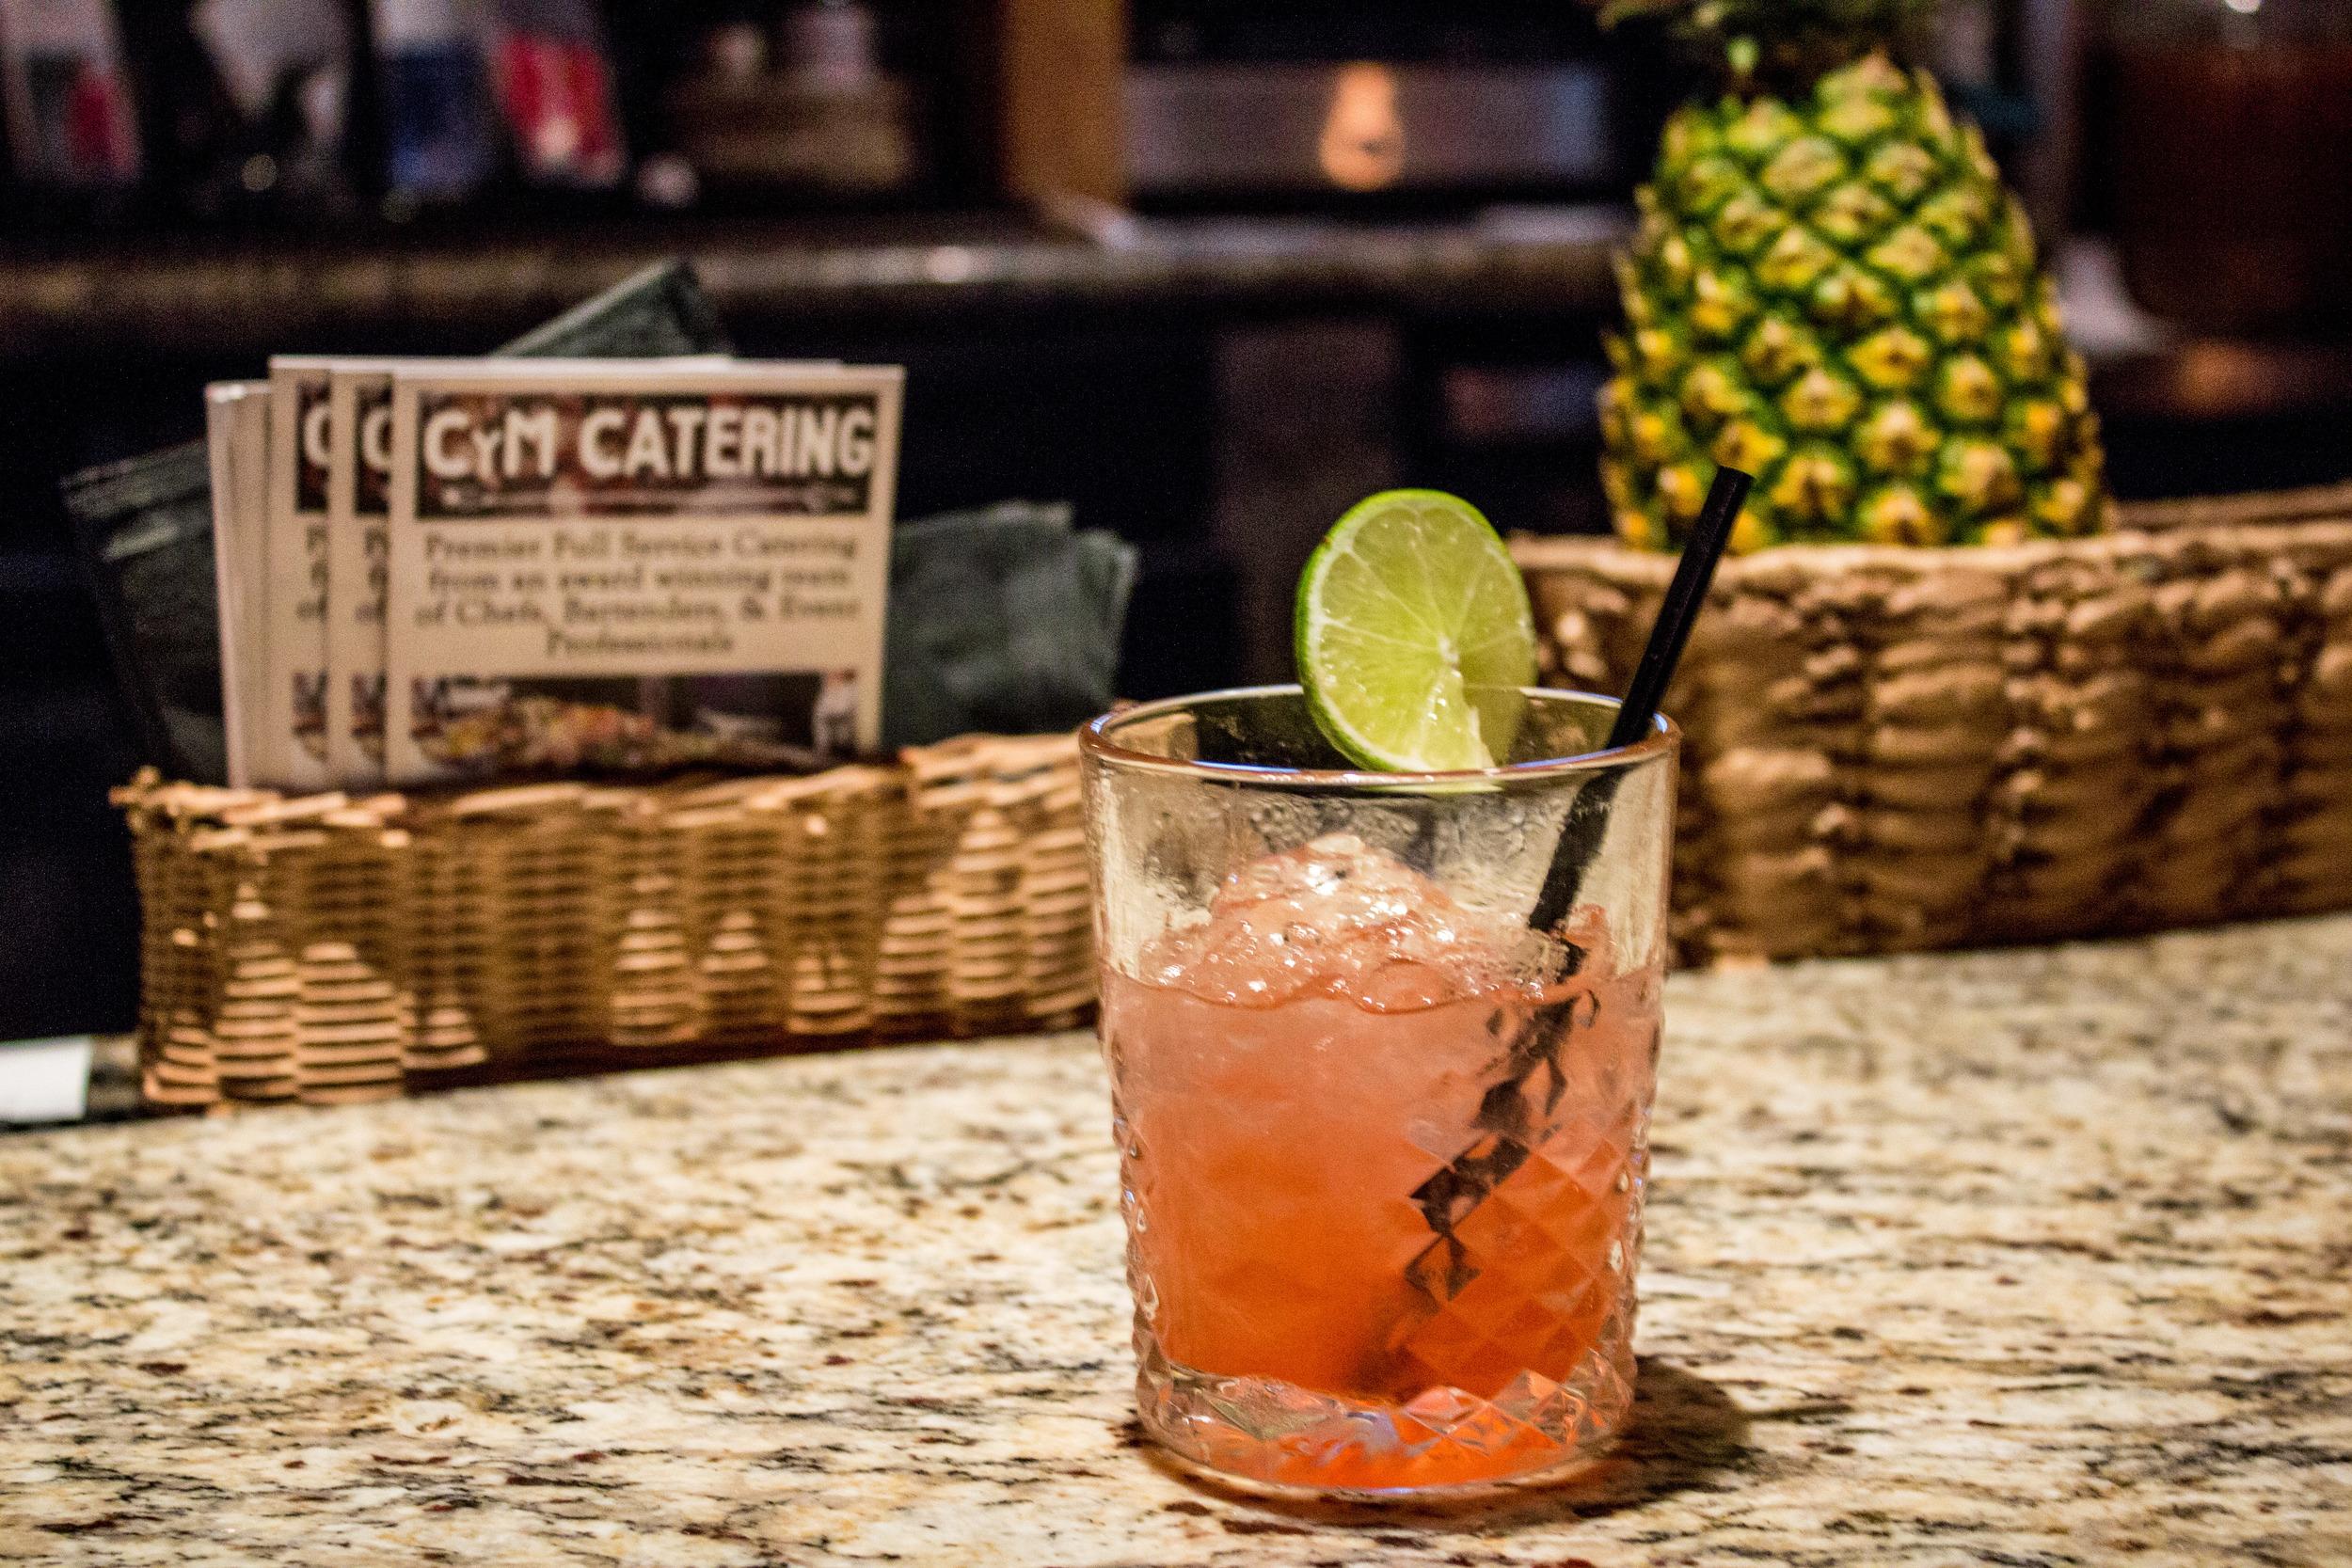 Cocktail 'Salsa Roja': Jalapeno infused tequila, watermelon, summer berries, cilantro, elderflower.